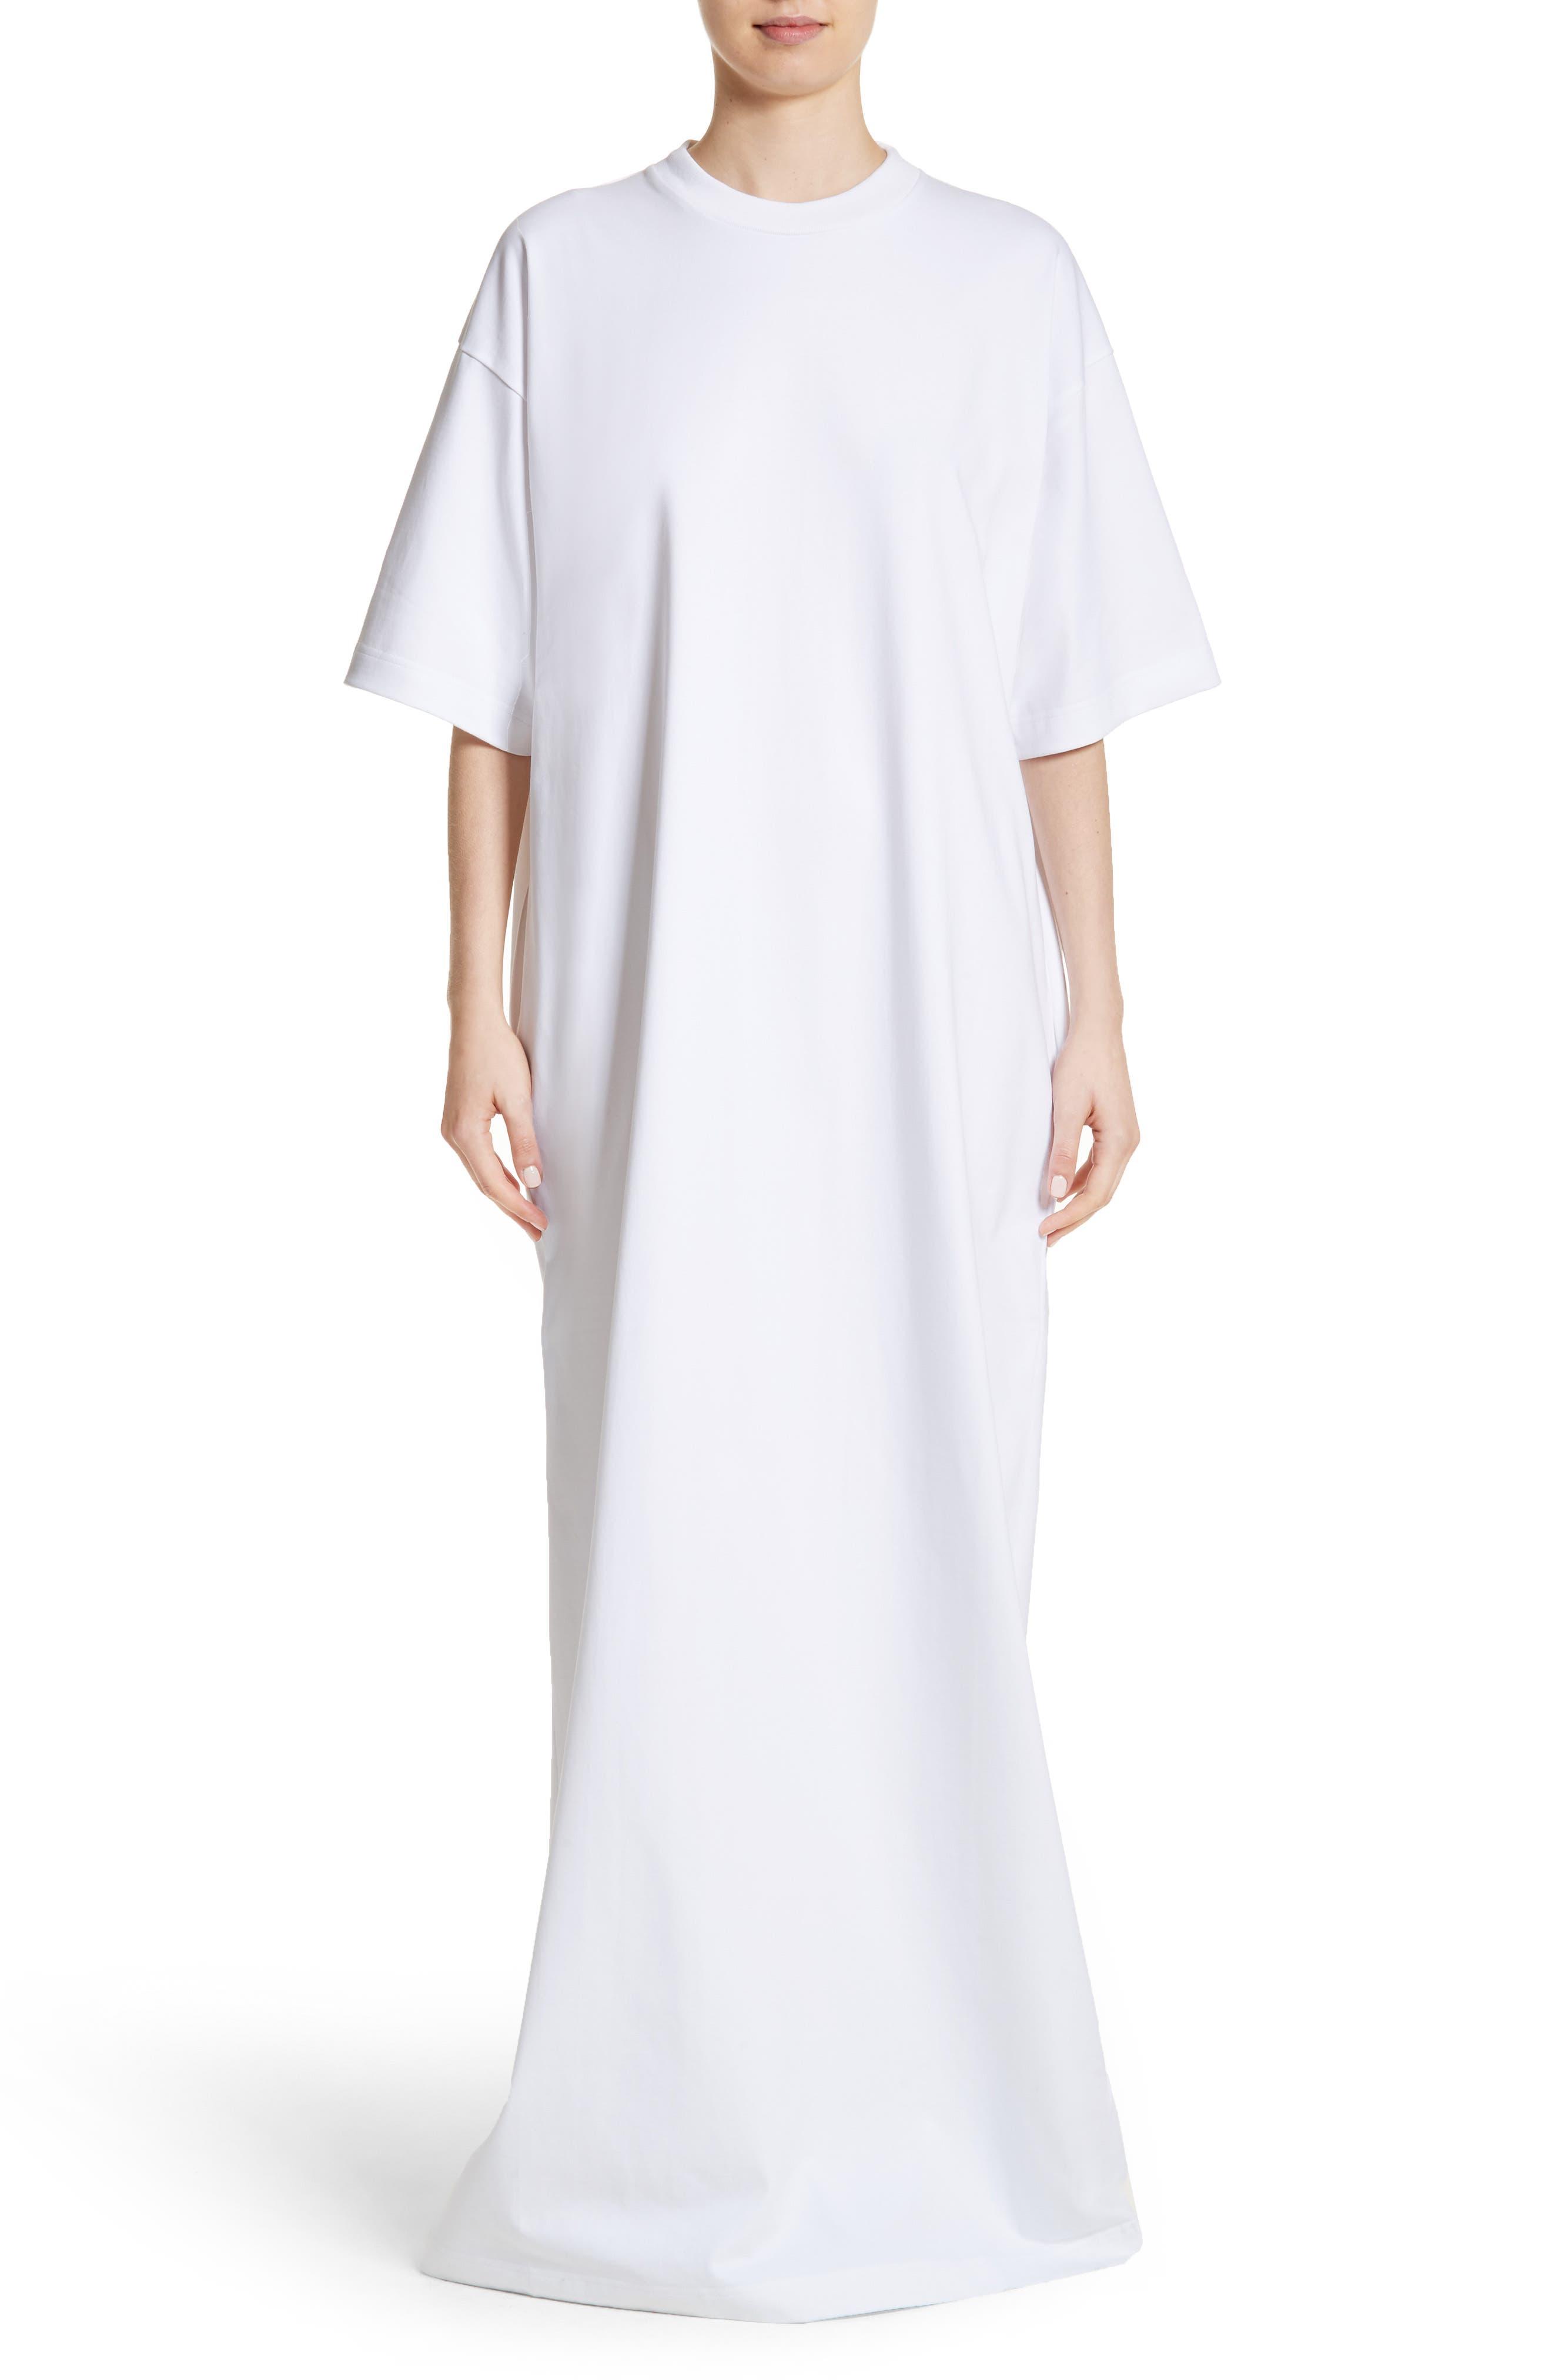 Main Image - Vetements T-Shirt Dress